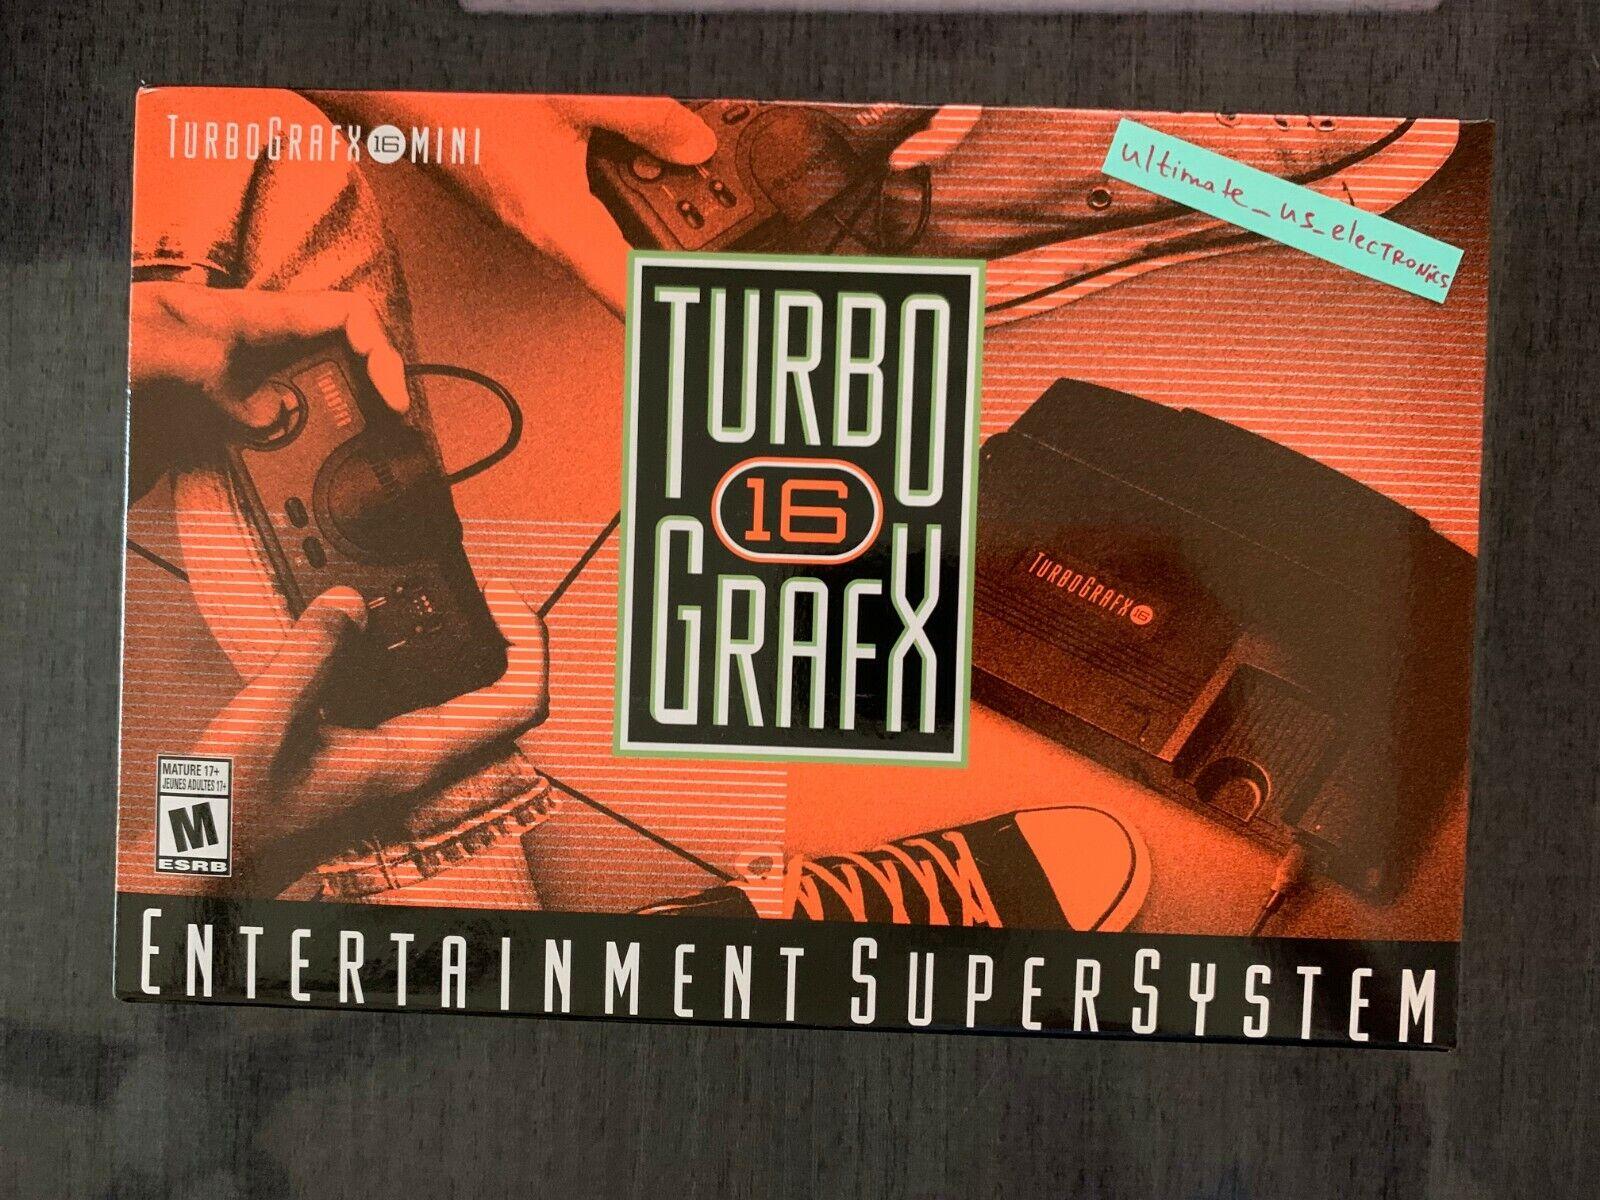 Turbografx 16 Mini Game Console 2020 PC Engine TG16 HDMI Brand New Free Shipping